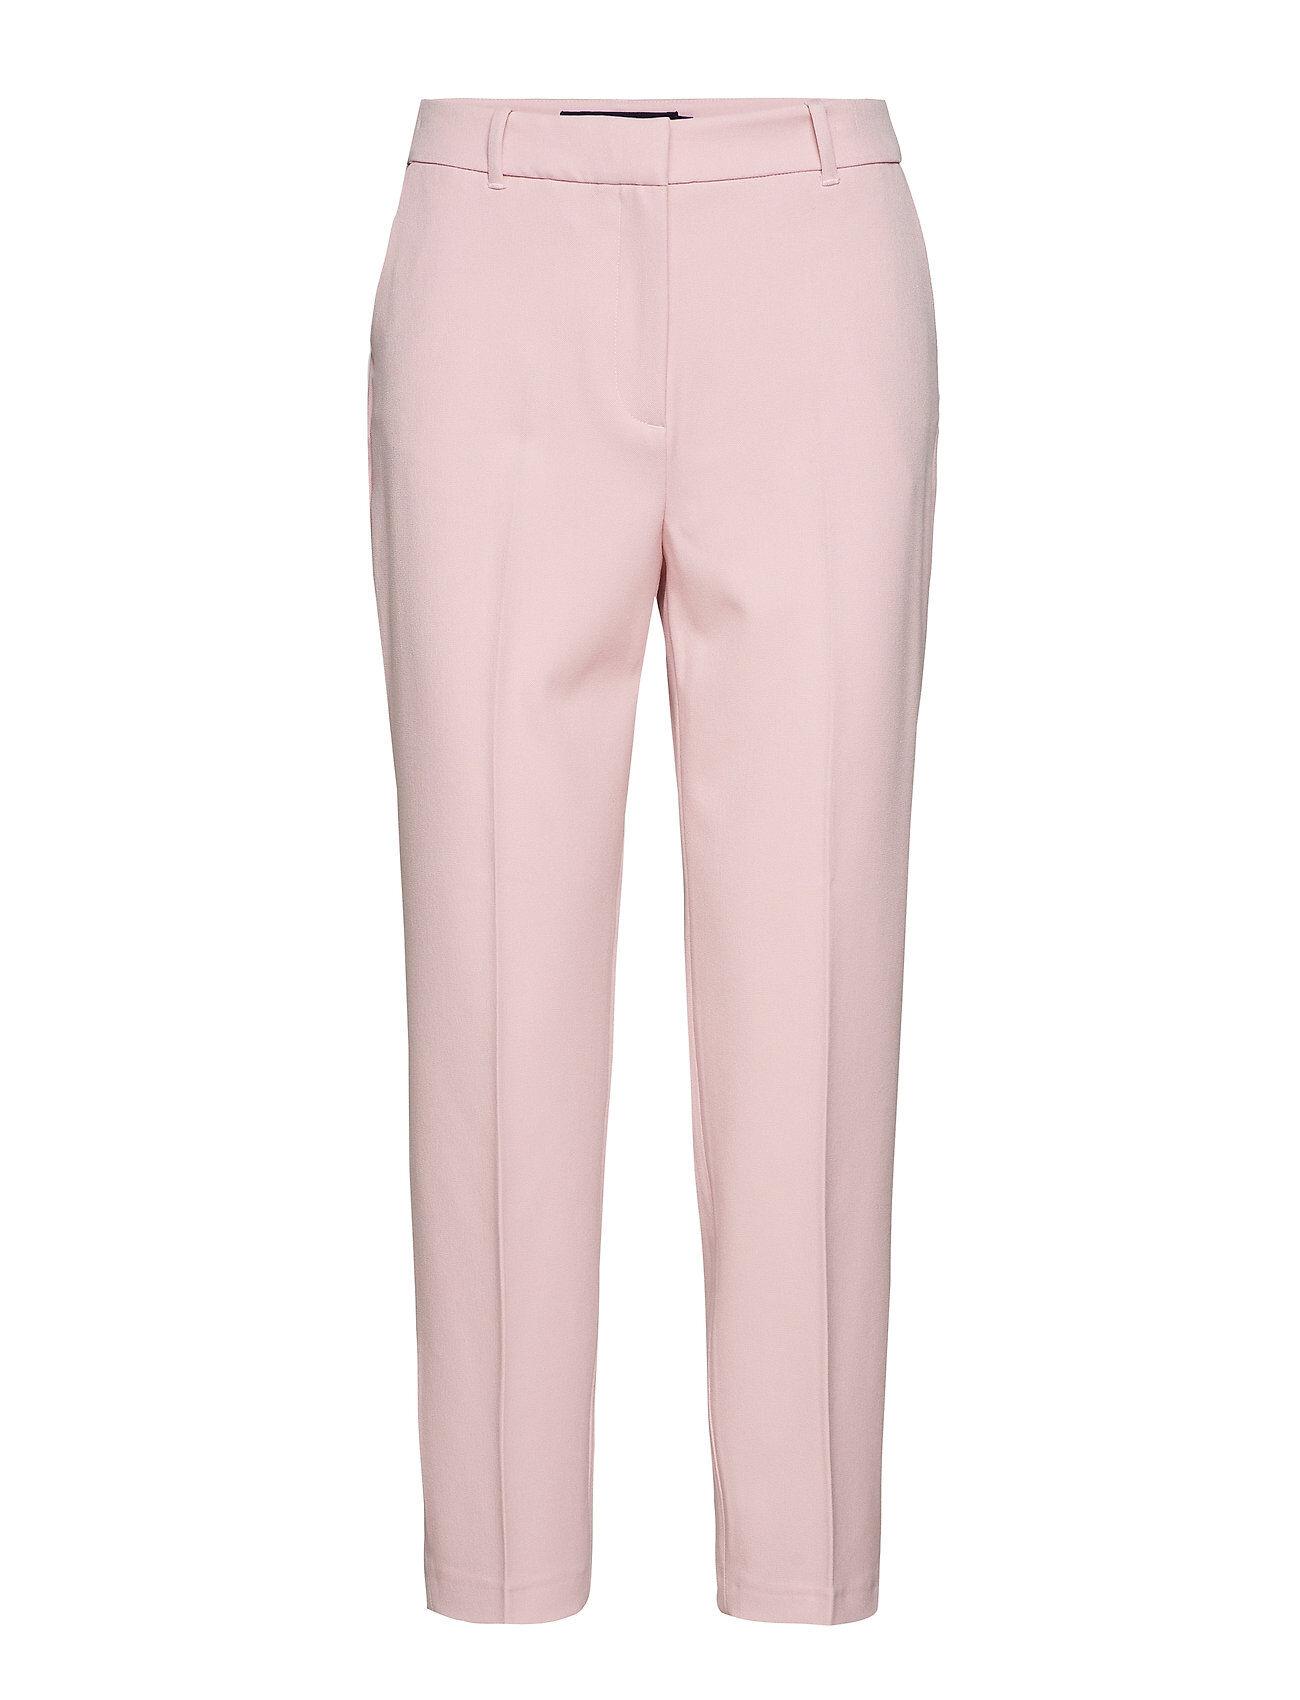 Vero Moda Vmvendela  Ankle Trousers Vmc